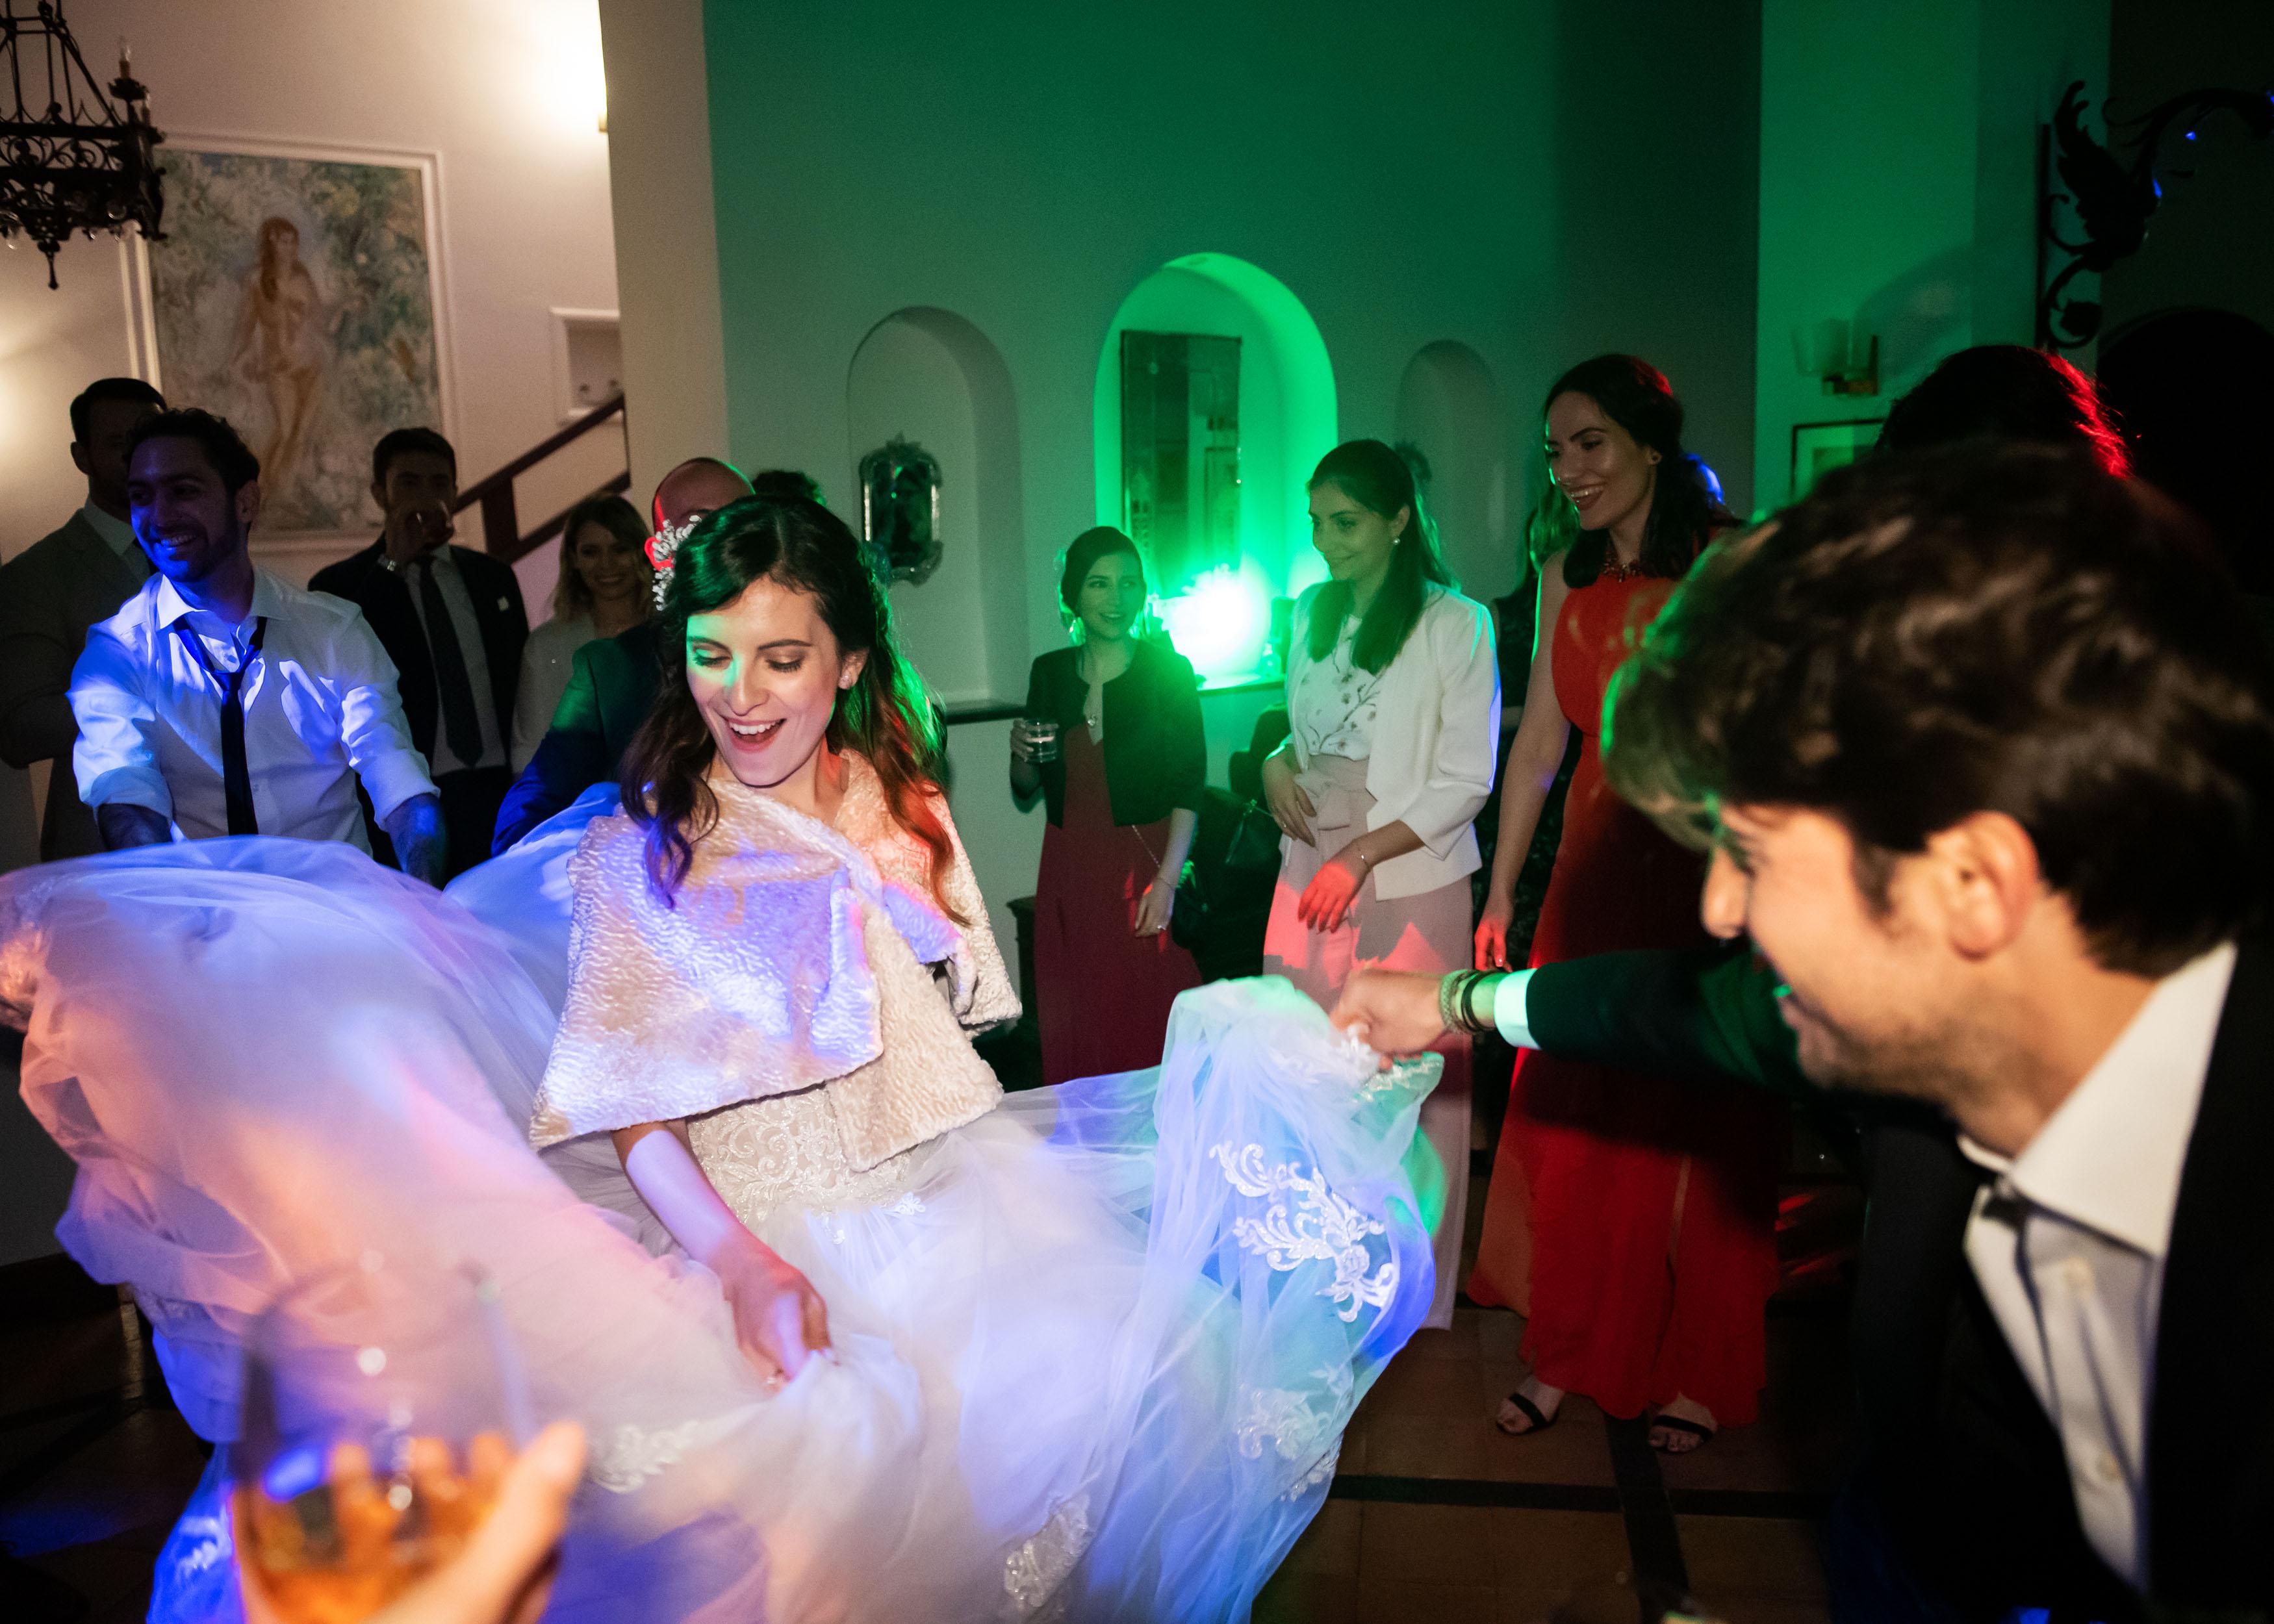 https://www.weddingamalfi.com/wp-content/uploads/Katia-Jorge-18-maggio-2019-45.jpg